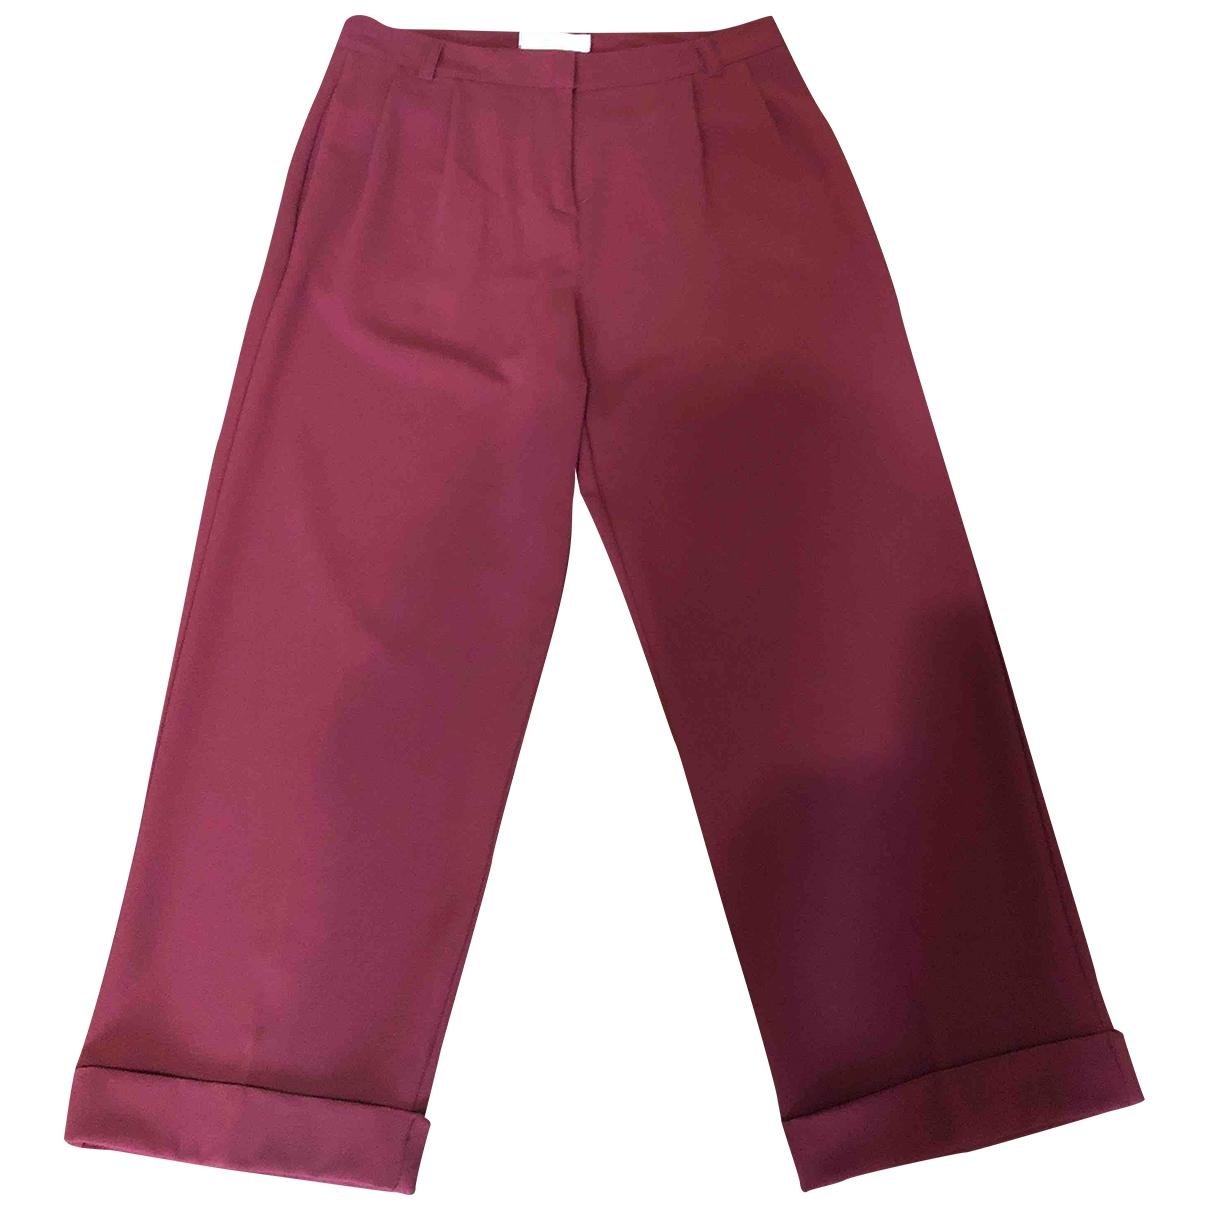 Vicolo \N Burgundy Trousers for Women M International